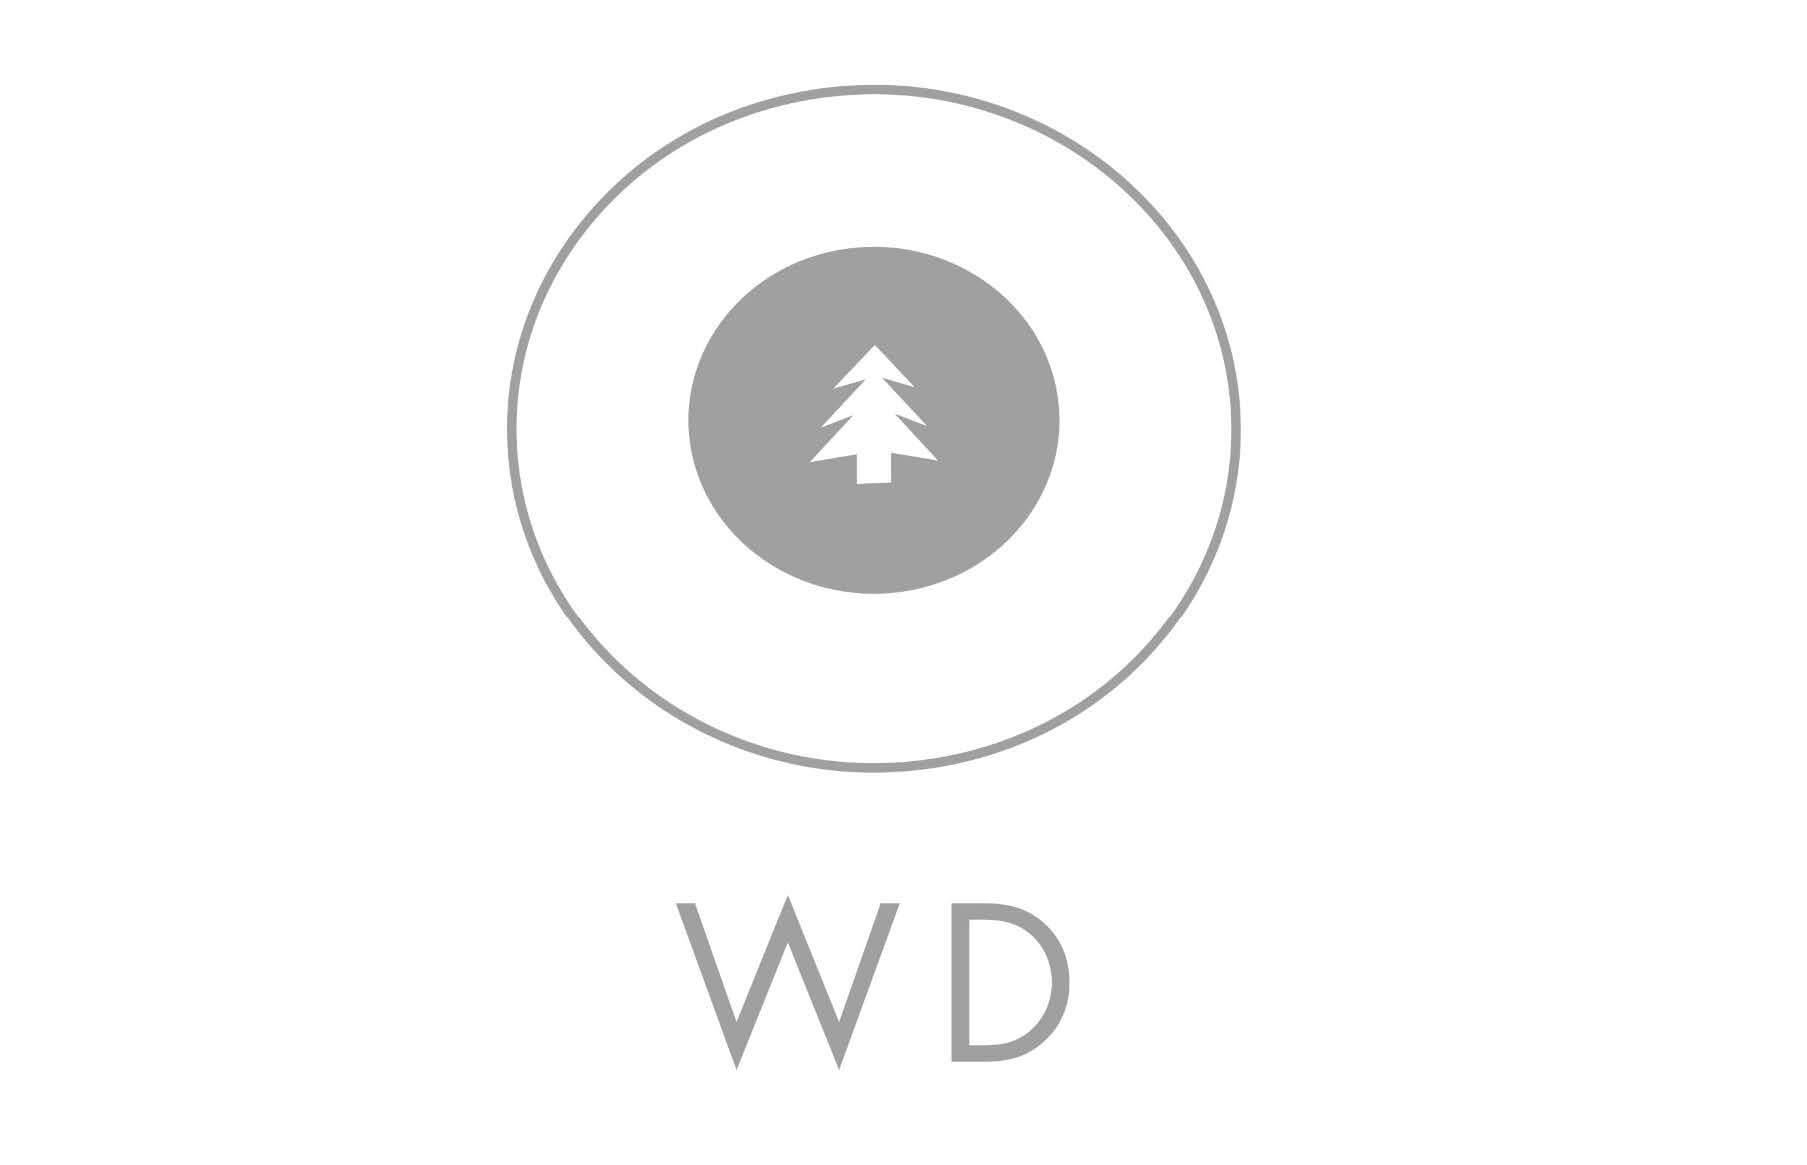 resized wd flooring logo website